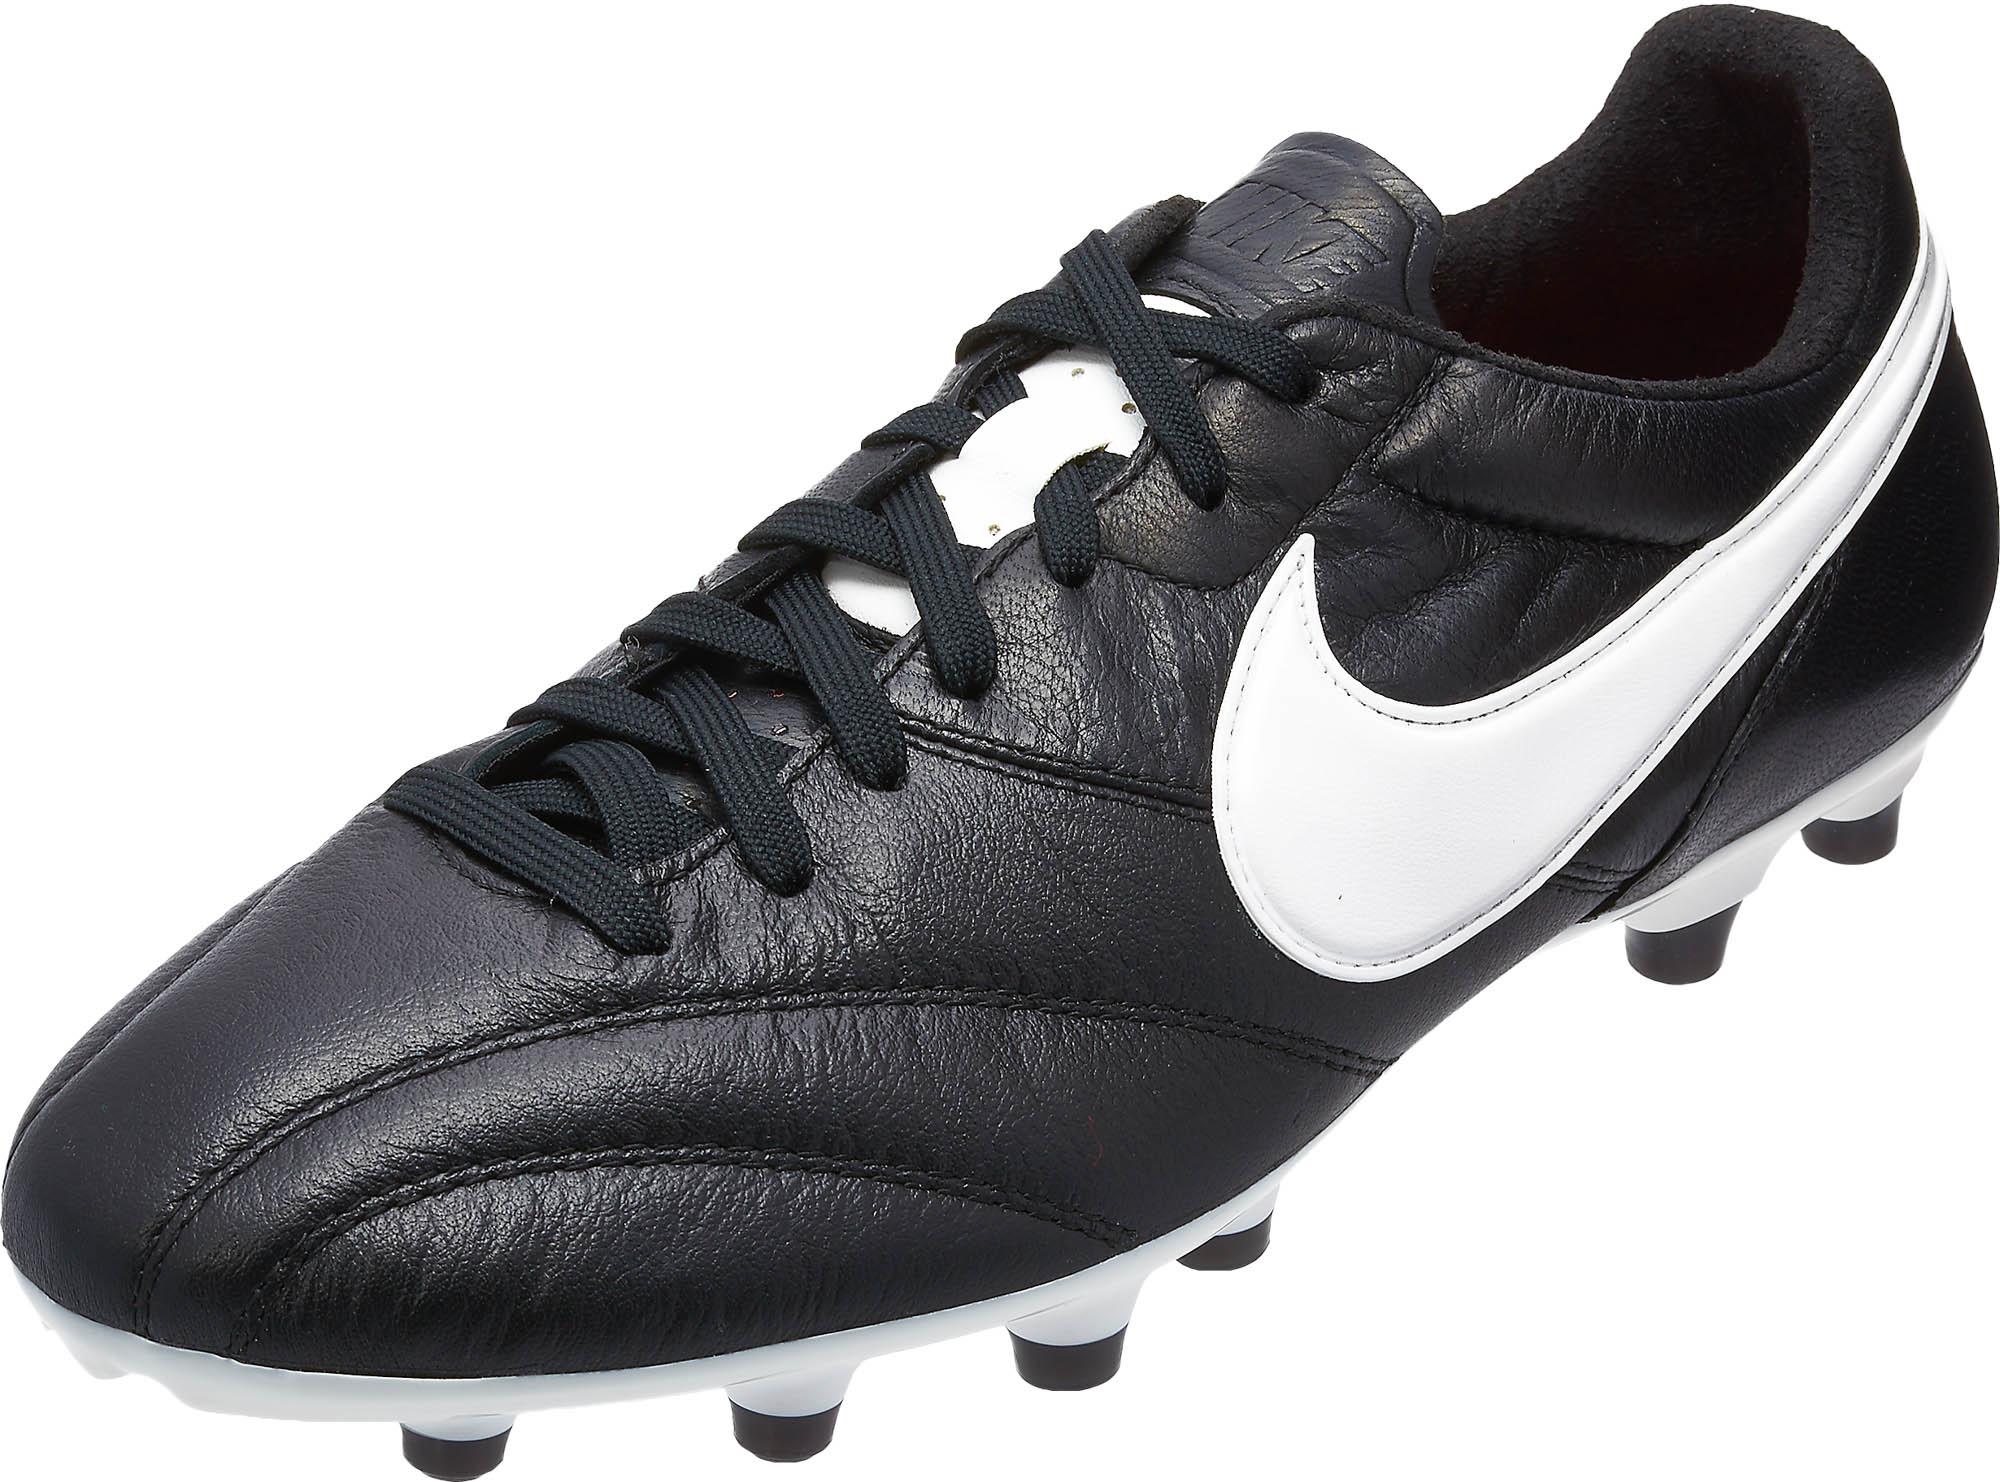 The Nike Premier FG - Black Nike Premier Soccer Cleats fb577d3ca